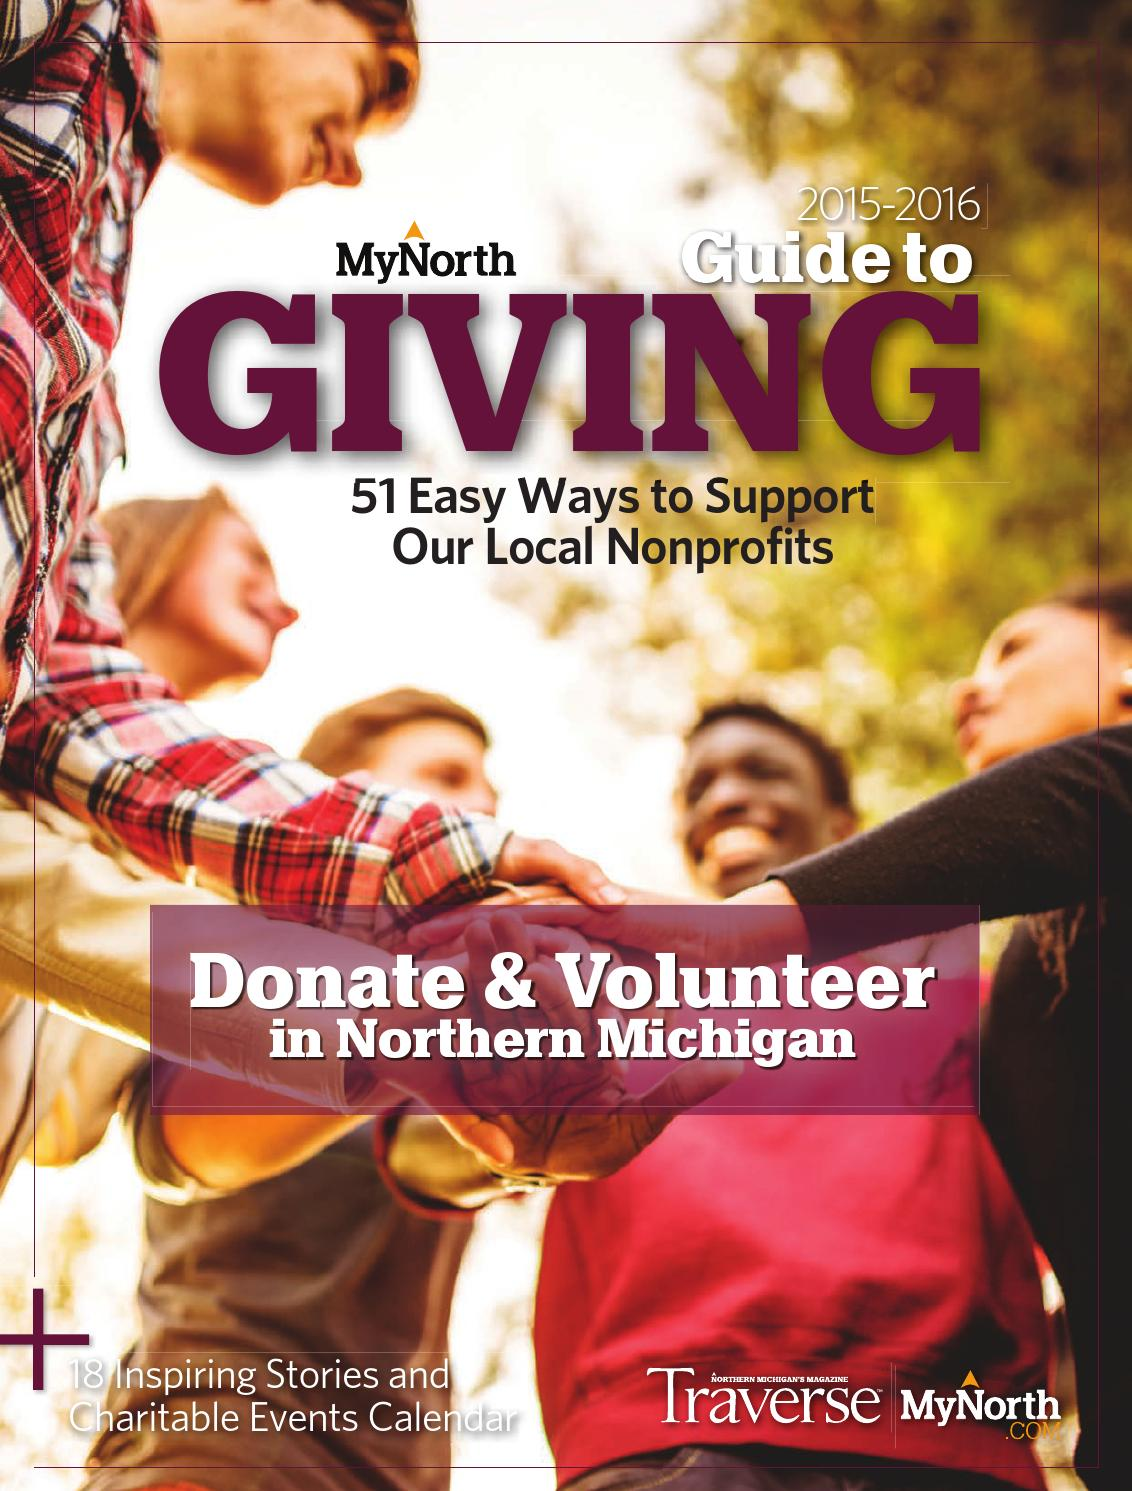 MyNorth Guide to Giving, 2015/2016 by MyNorth - issuu